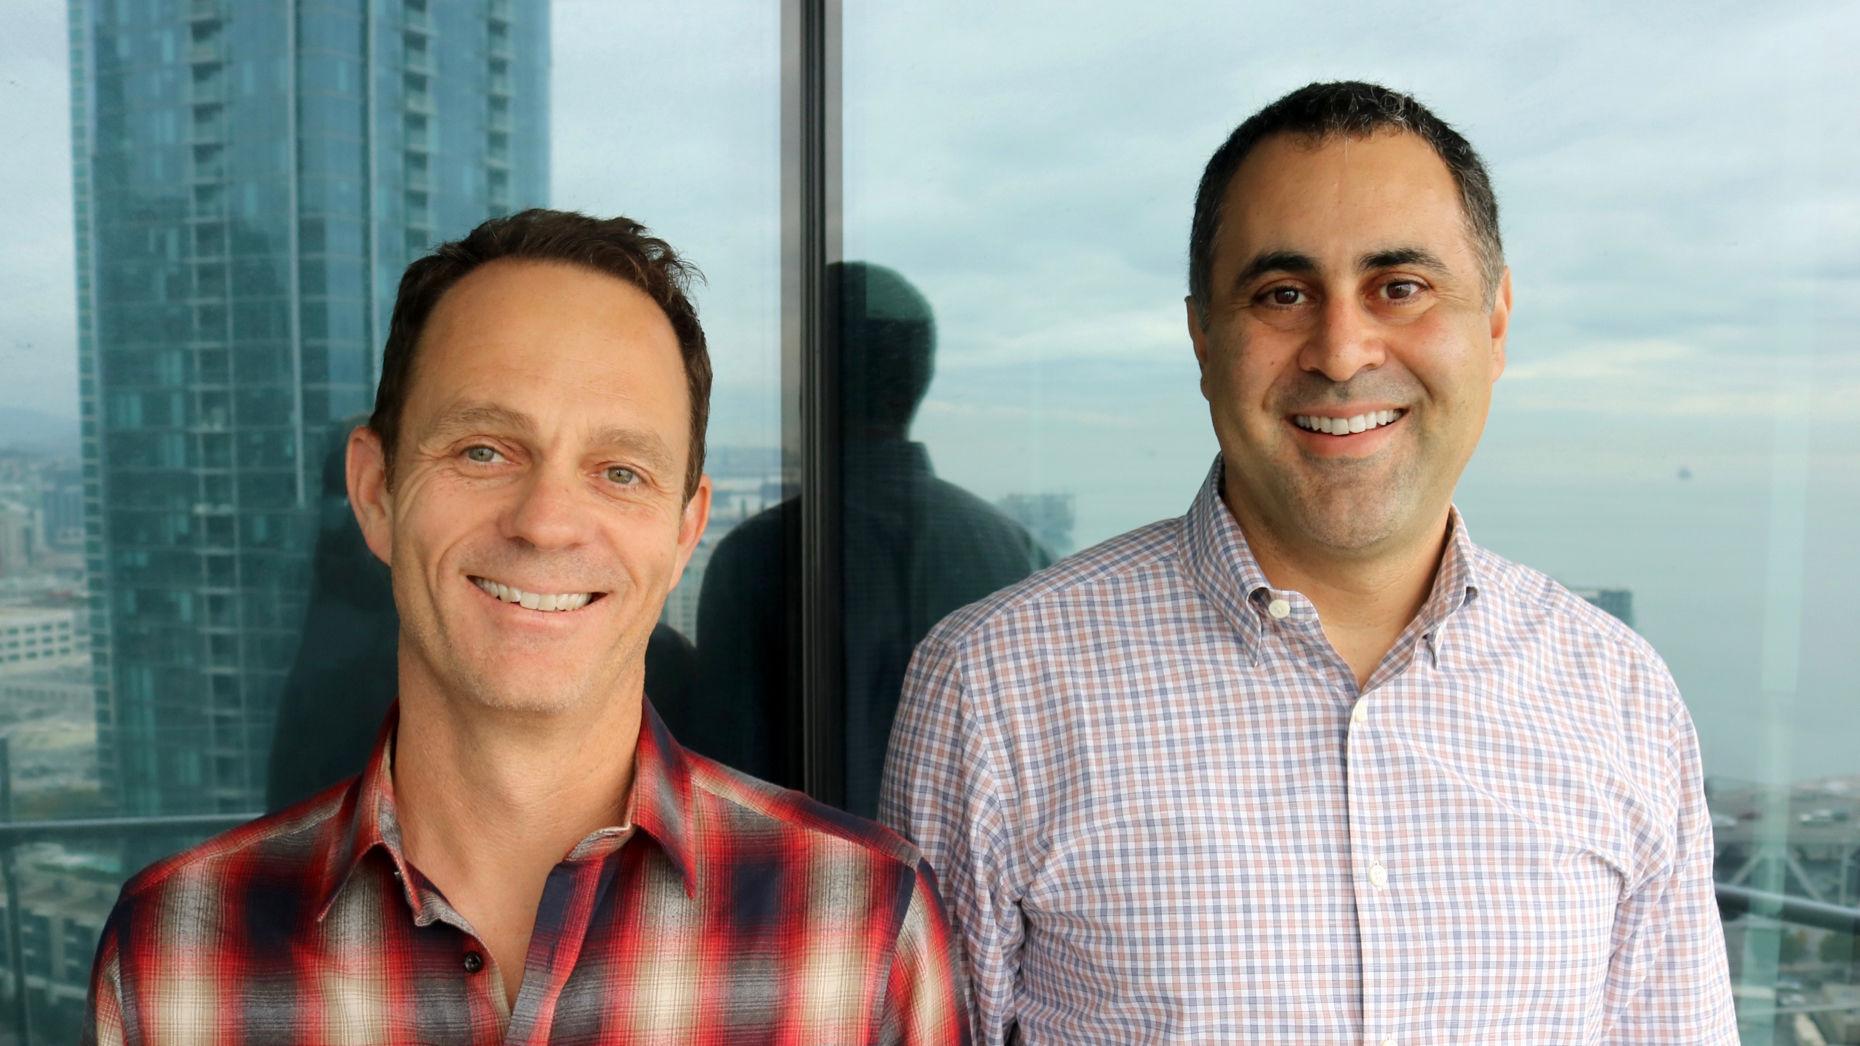 TerraTrue COO Chris Handman (left) and CEO Jad Boutros. Photo by TerraTrue